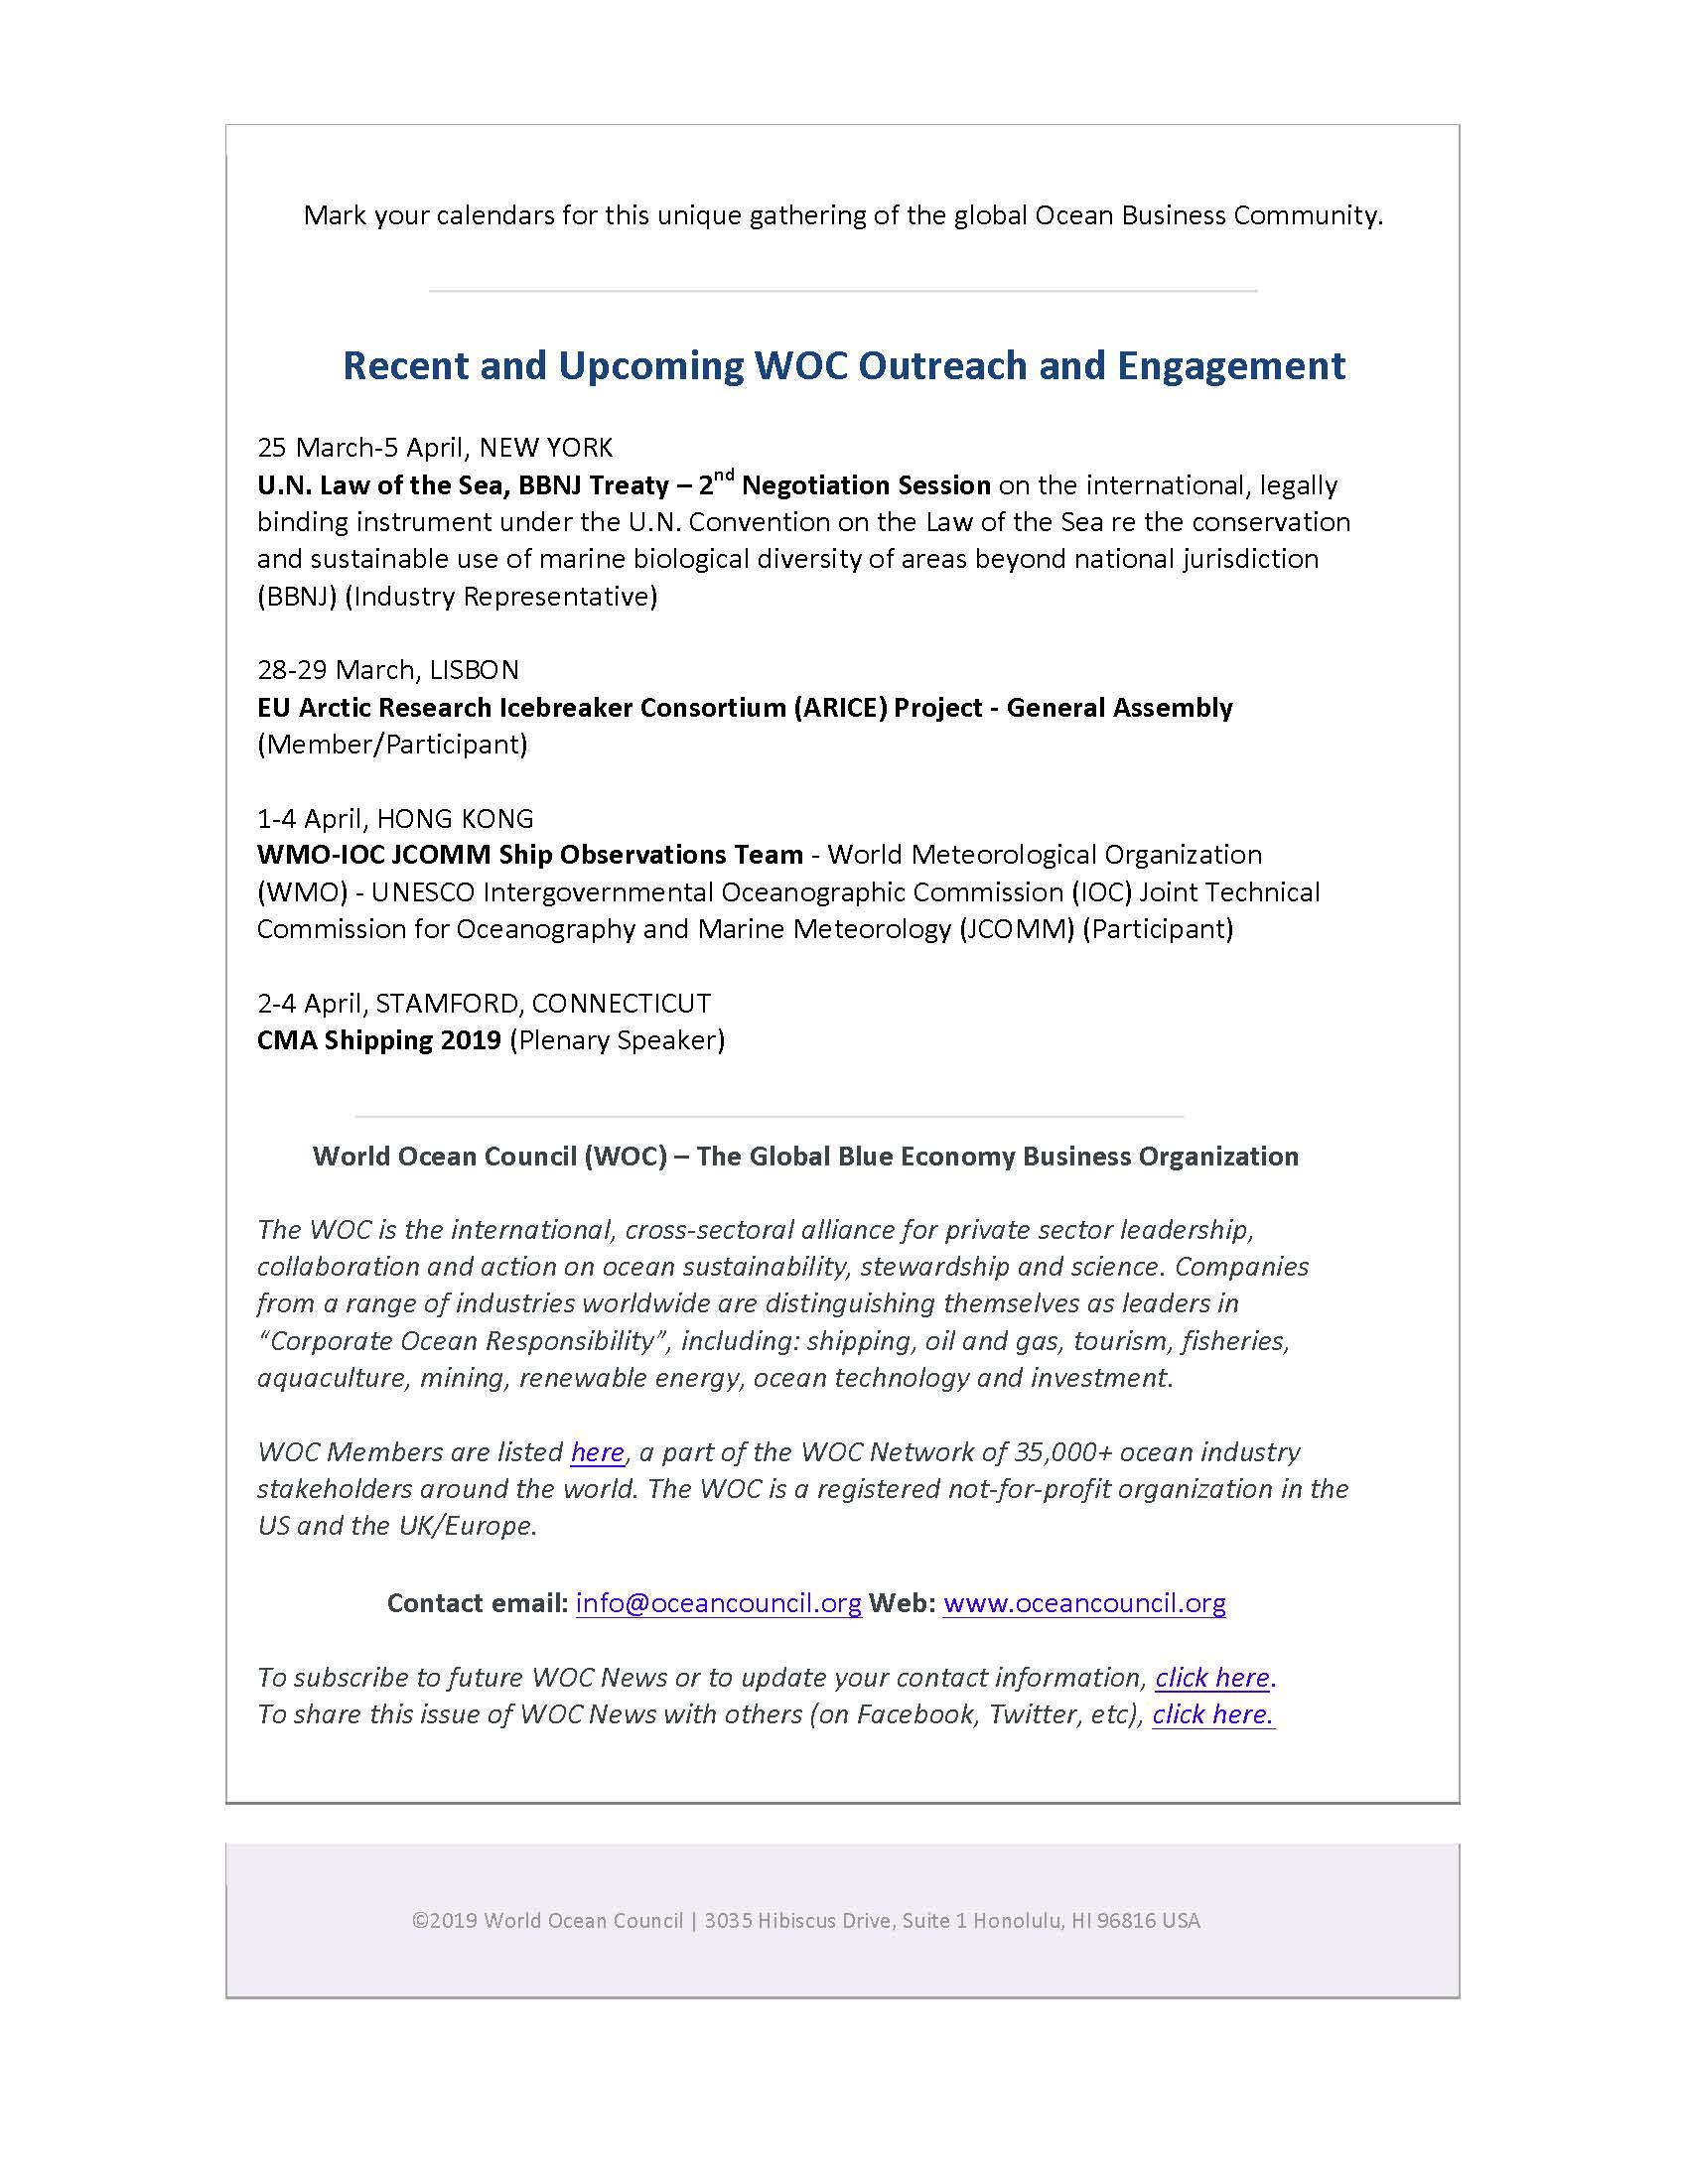 Seychelles Petroleum Company (SEYPEC) Joins World Ocean Council (WOC) - 29 March 2019